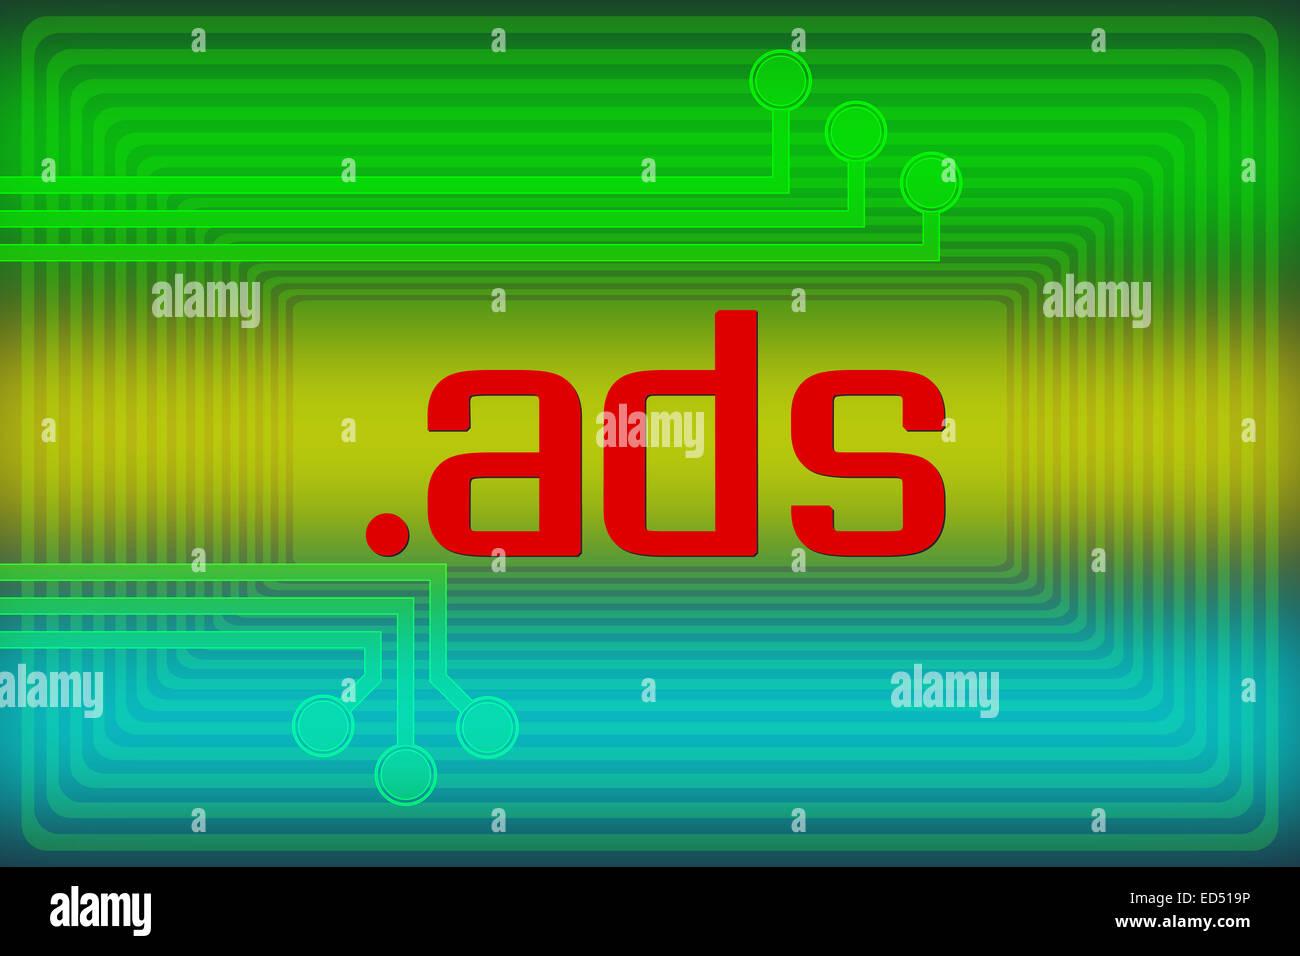 Illustration of internet address dot ads domain name - Stock Image